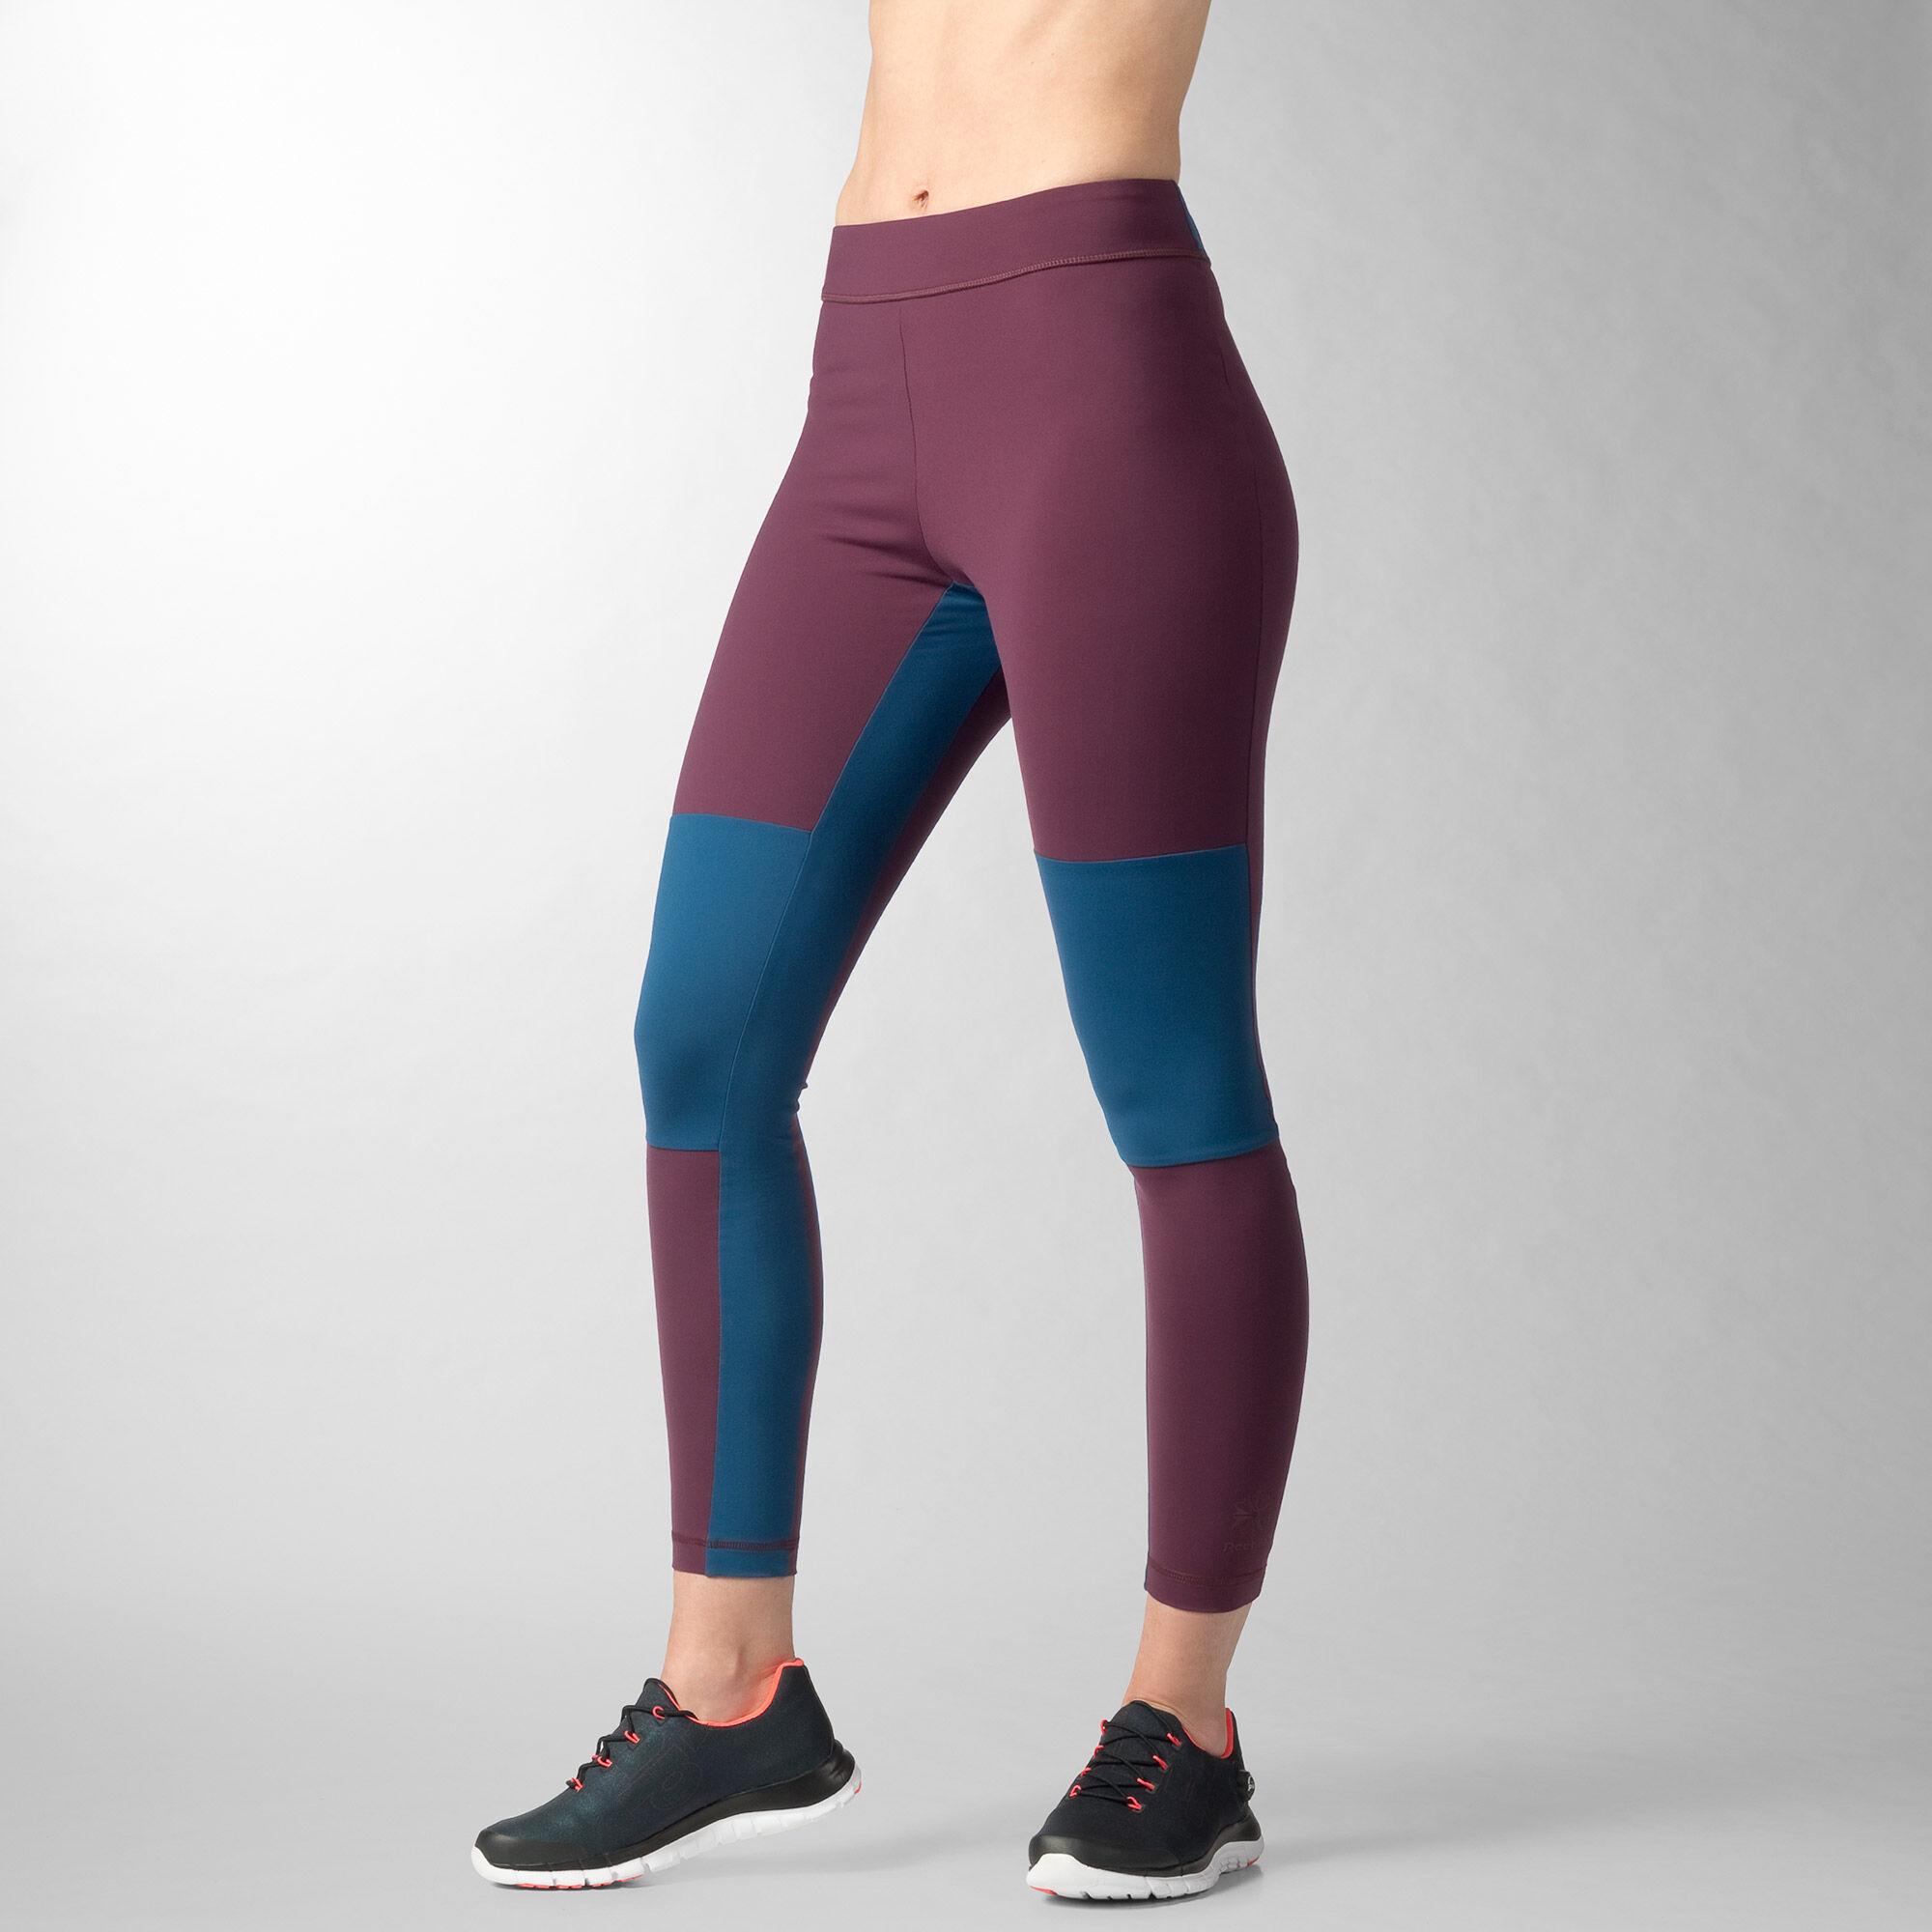 femmes reebok classics running leggings. Black Bedroom Furniture Sets. Home Design Ideas